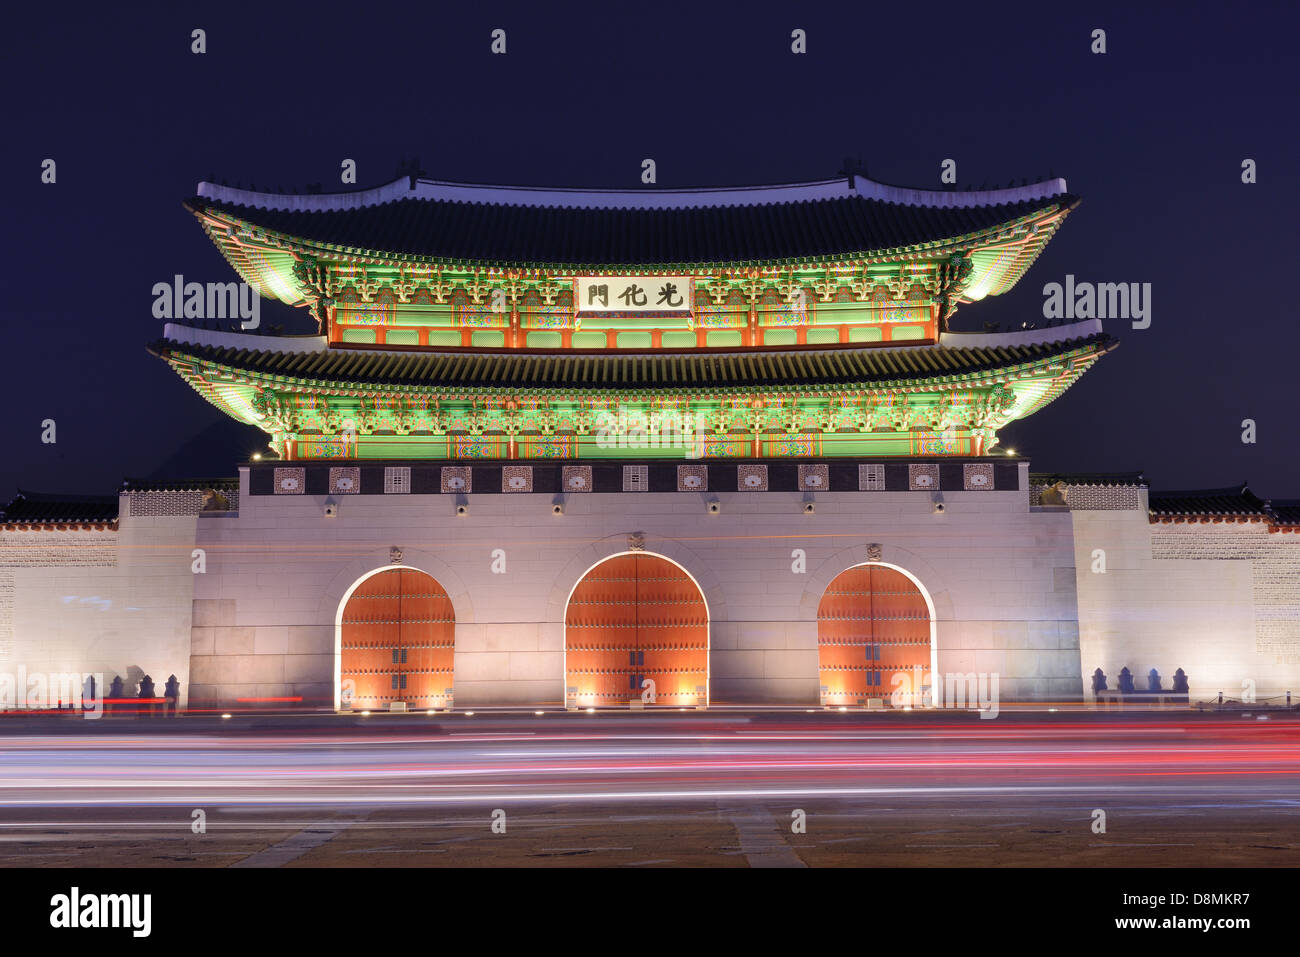 Gwanghwamun gate at Gyeongbokgung Palace in Seoul, South Korea. - Stock Image